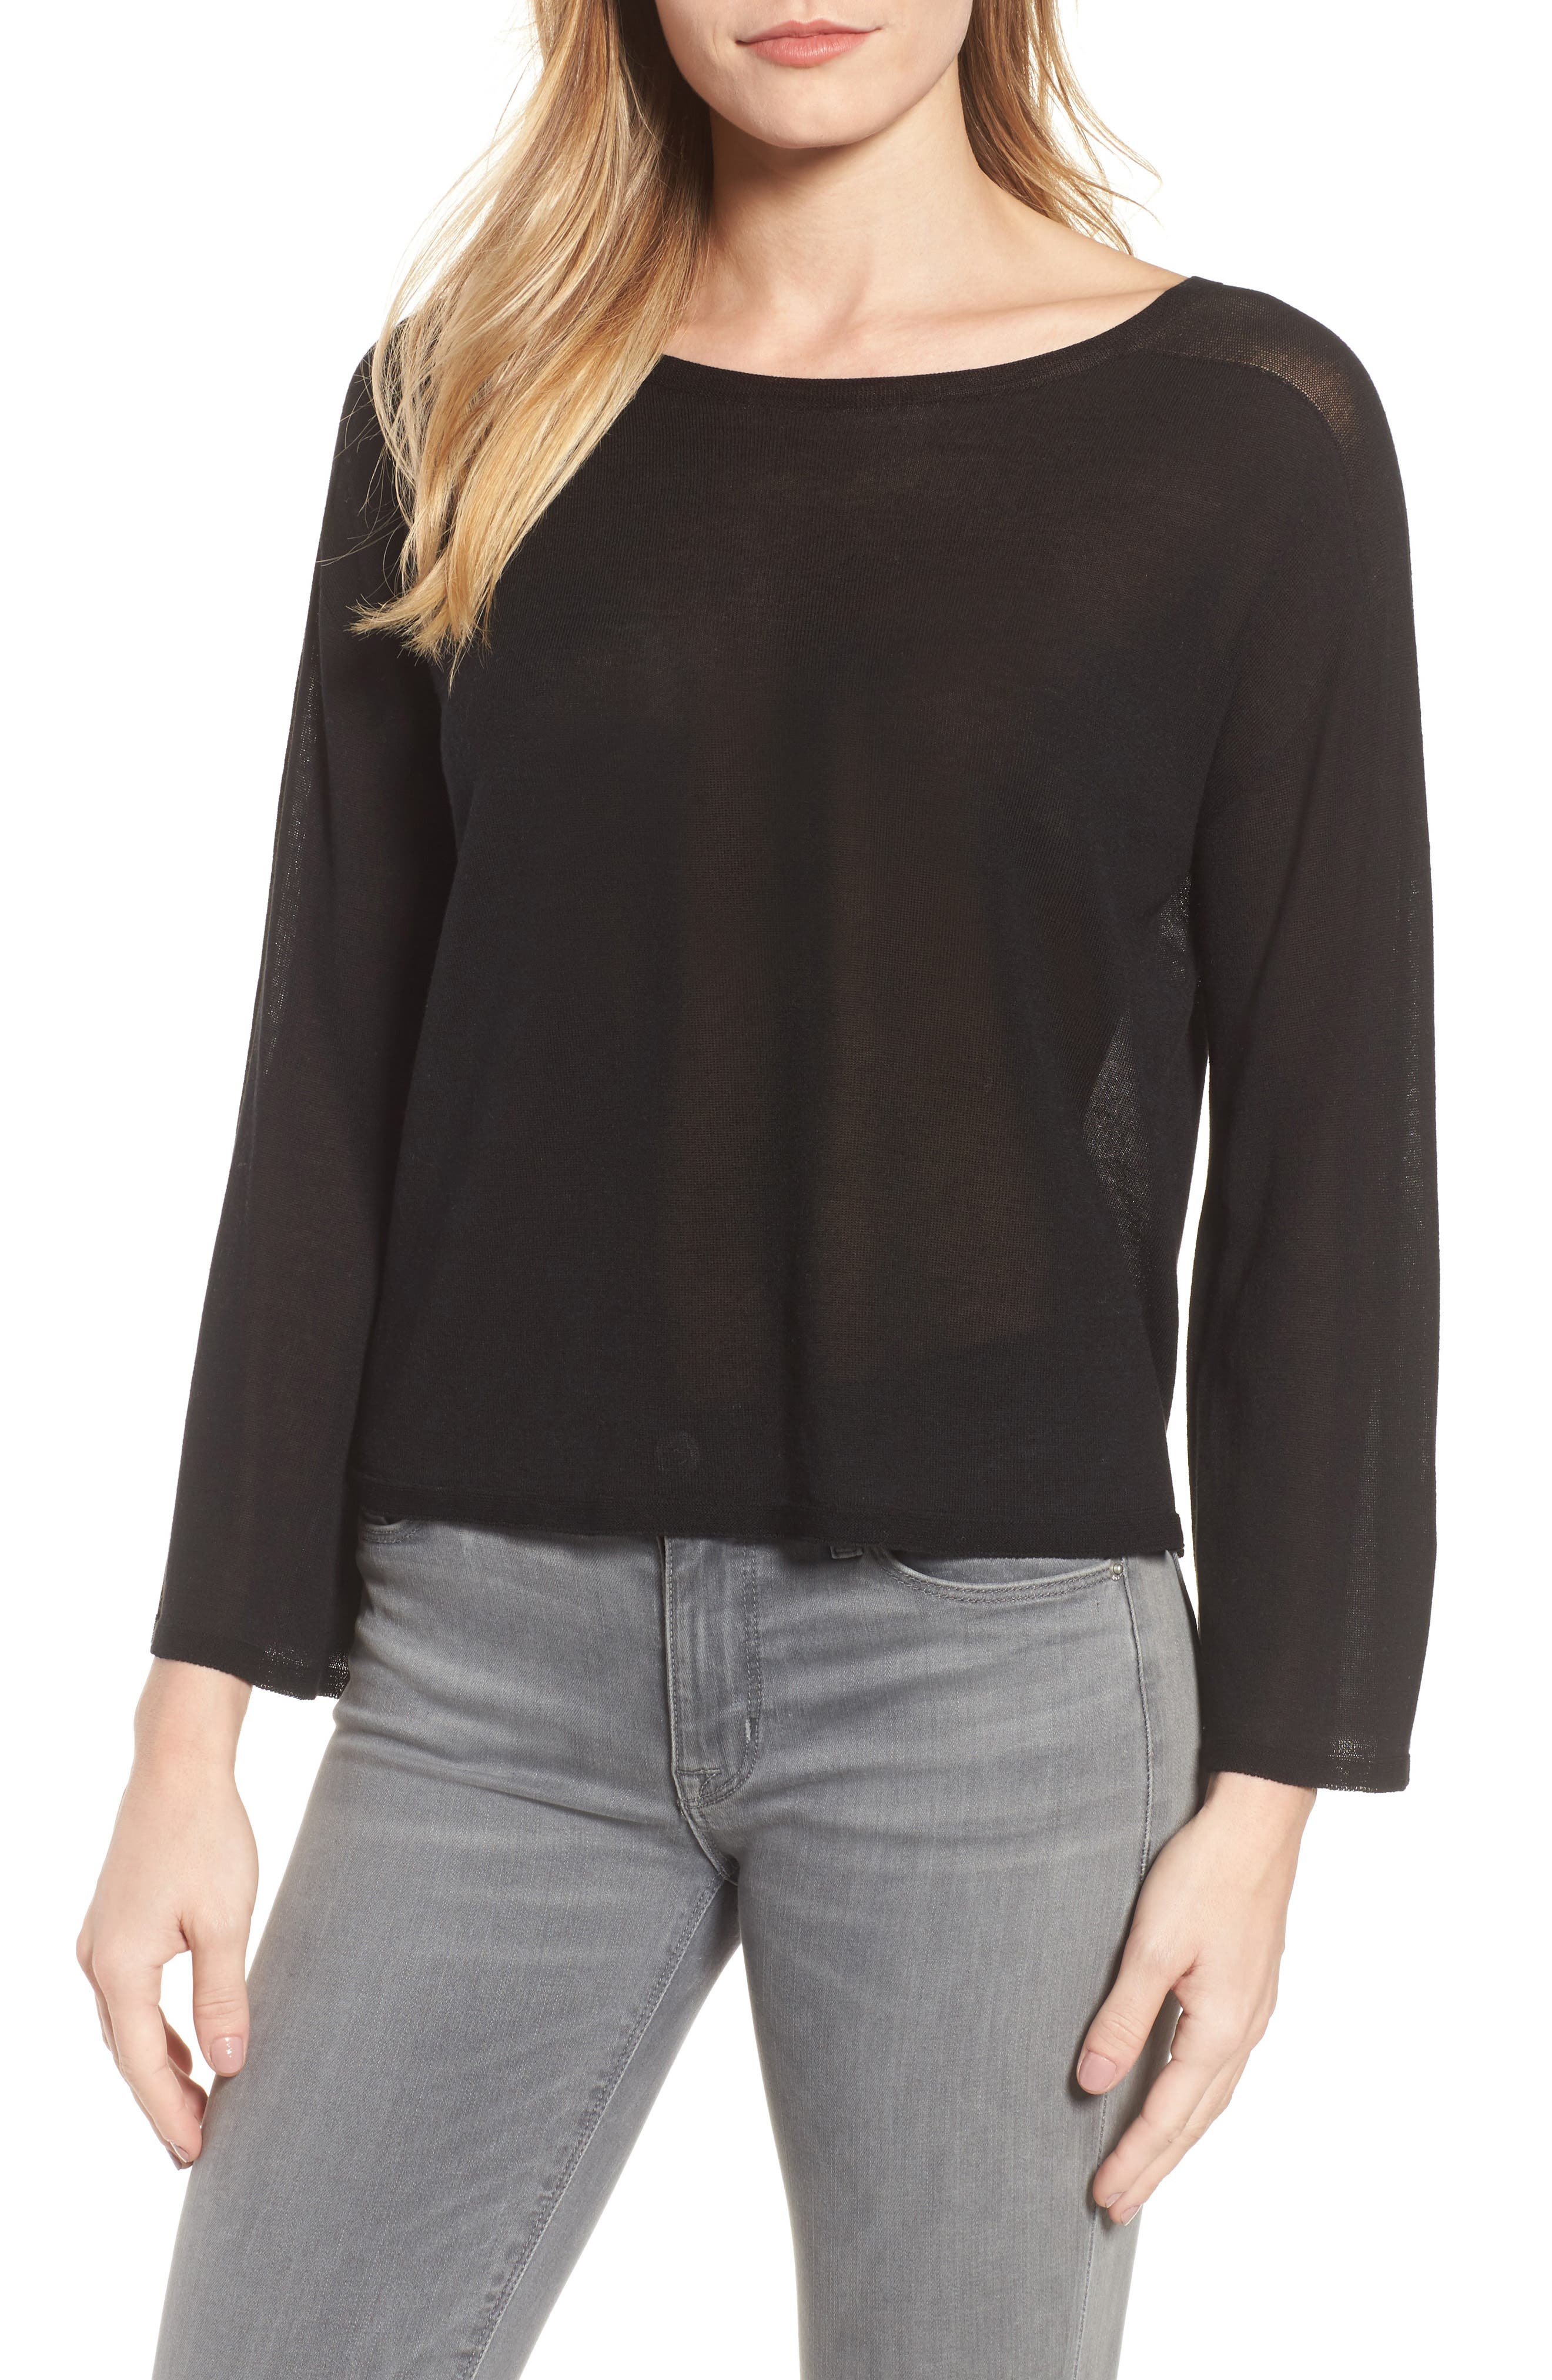 Tencel<sup>®</sup> Lyocell Knit Sweater,                             Main thumbnail 1, color,                             Black